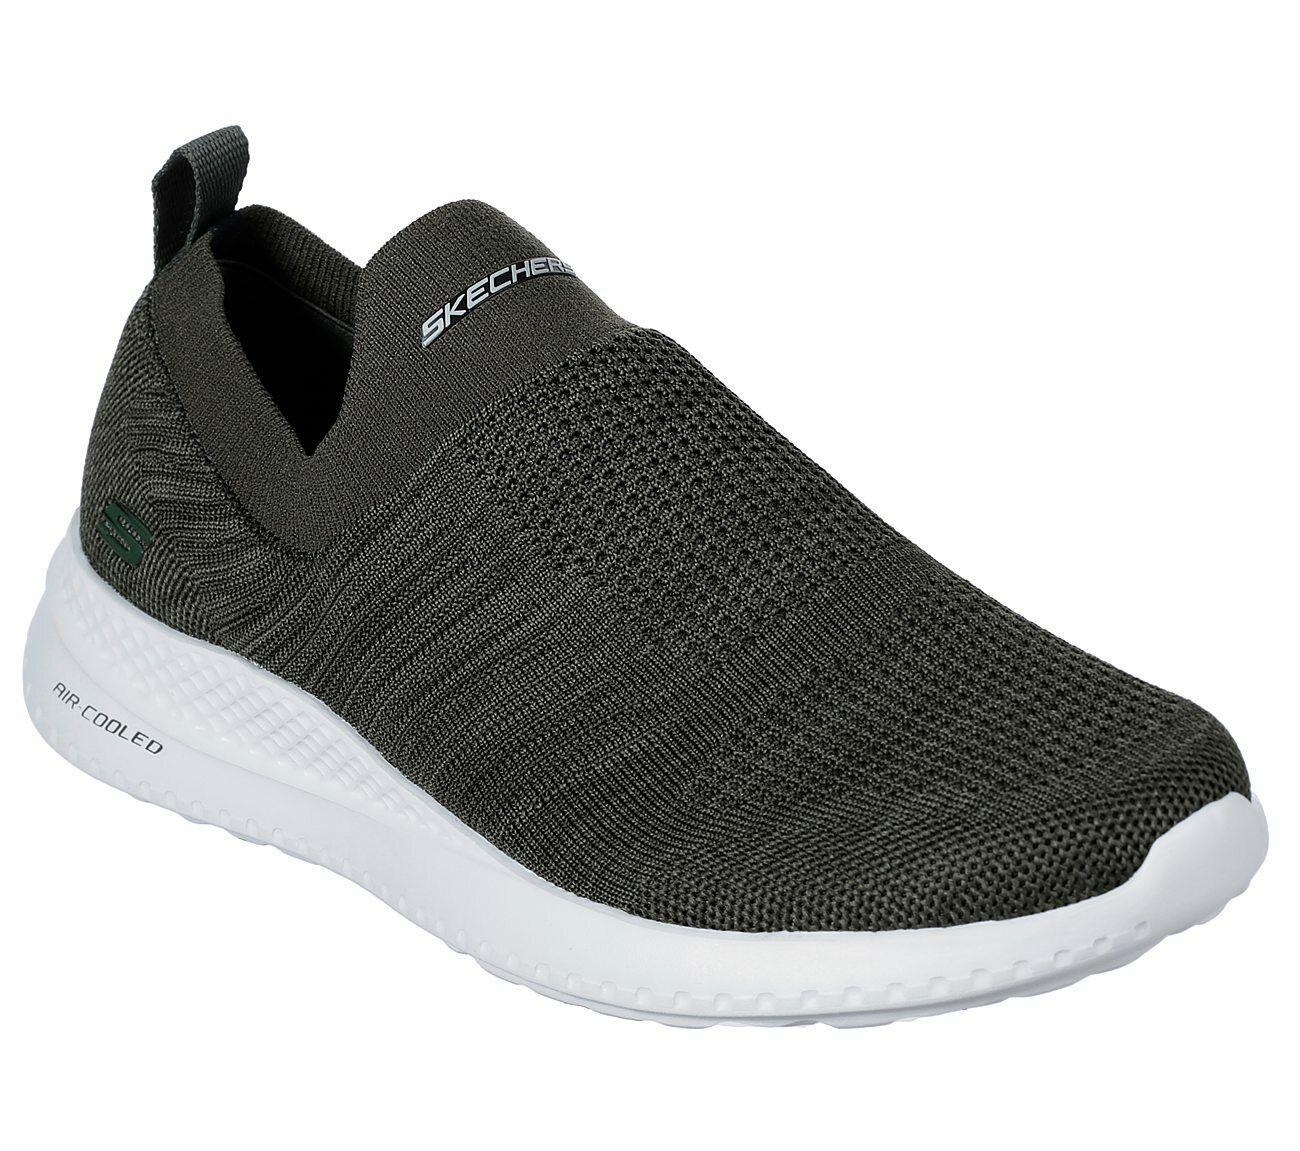 51521 Black Skechers Shoes Men's Memory Foam Comfort Slip On Casual Mesh Sneaker